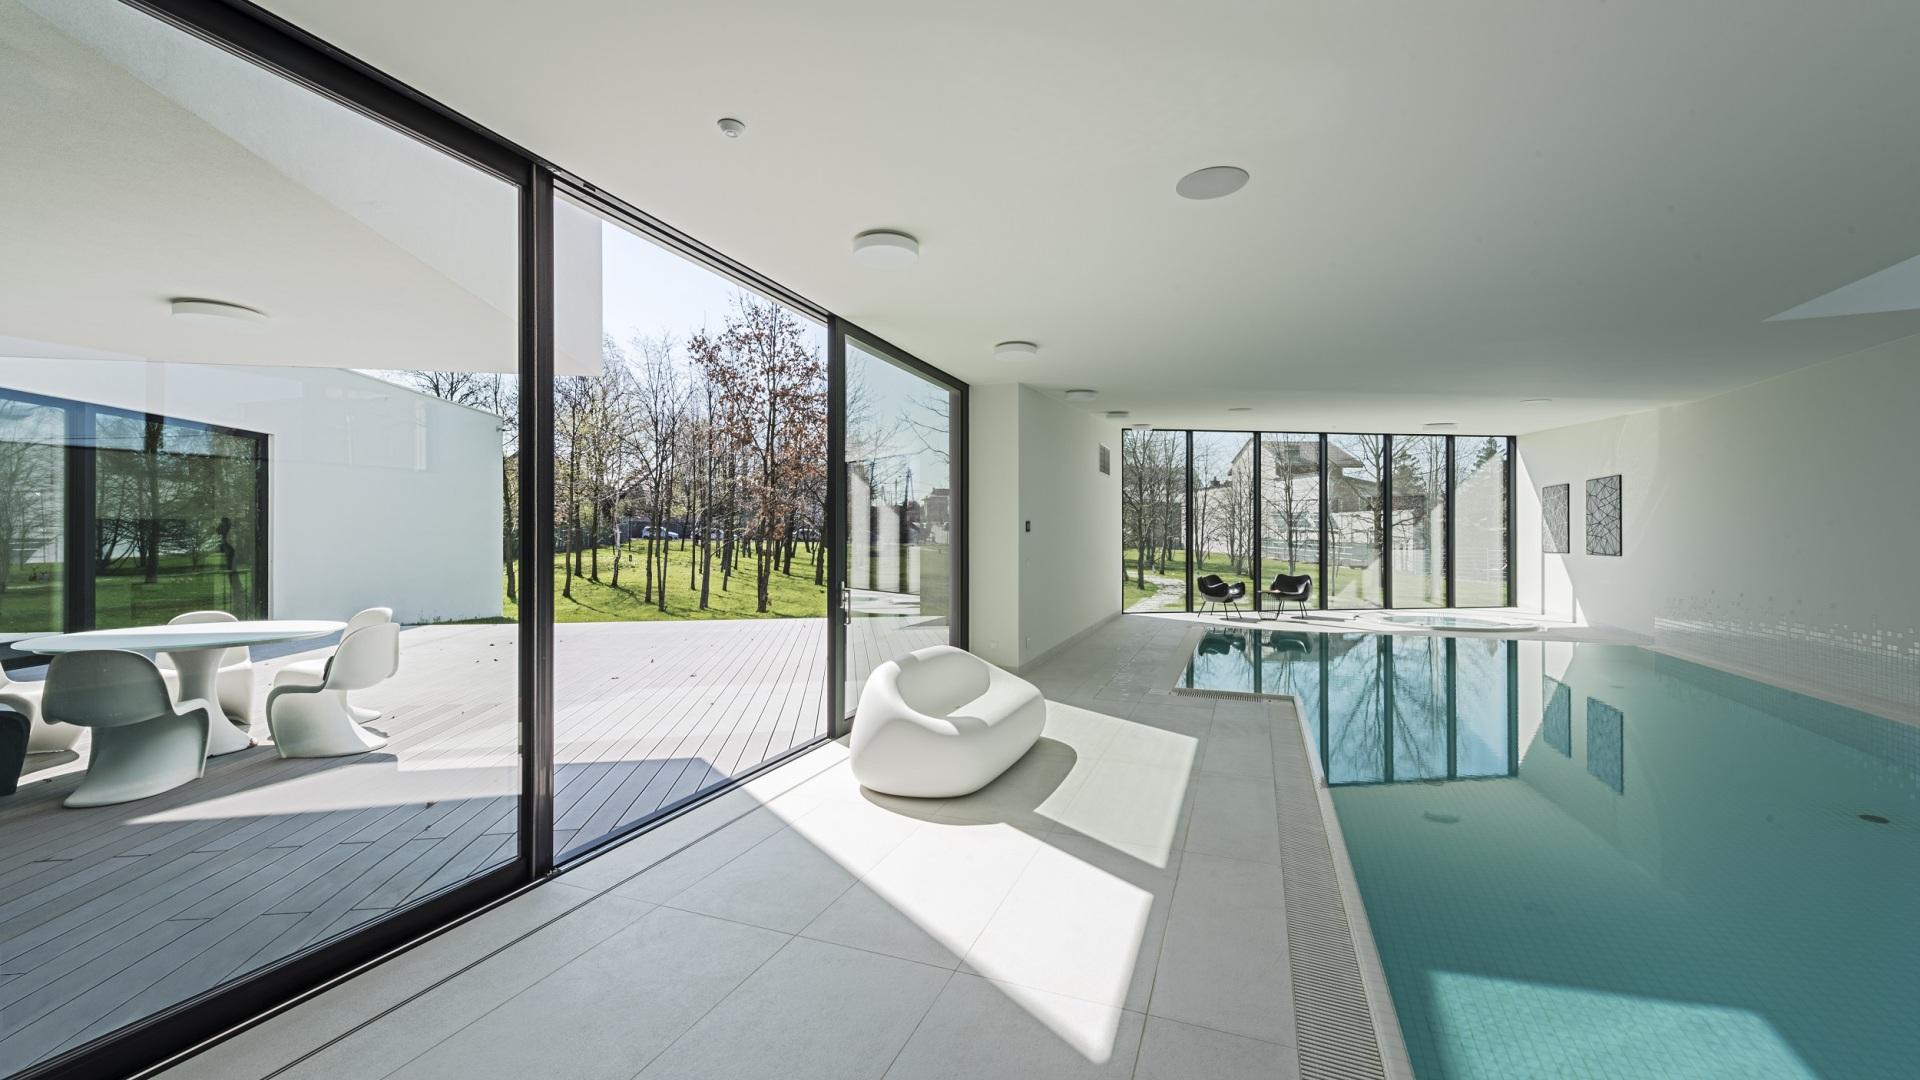 v_house_archistudio_designalive-10